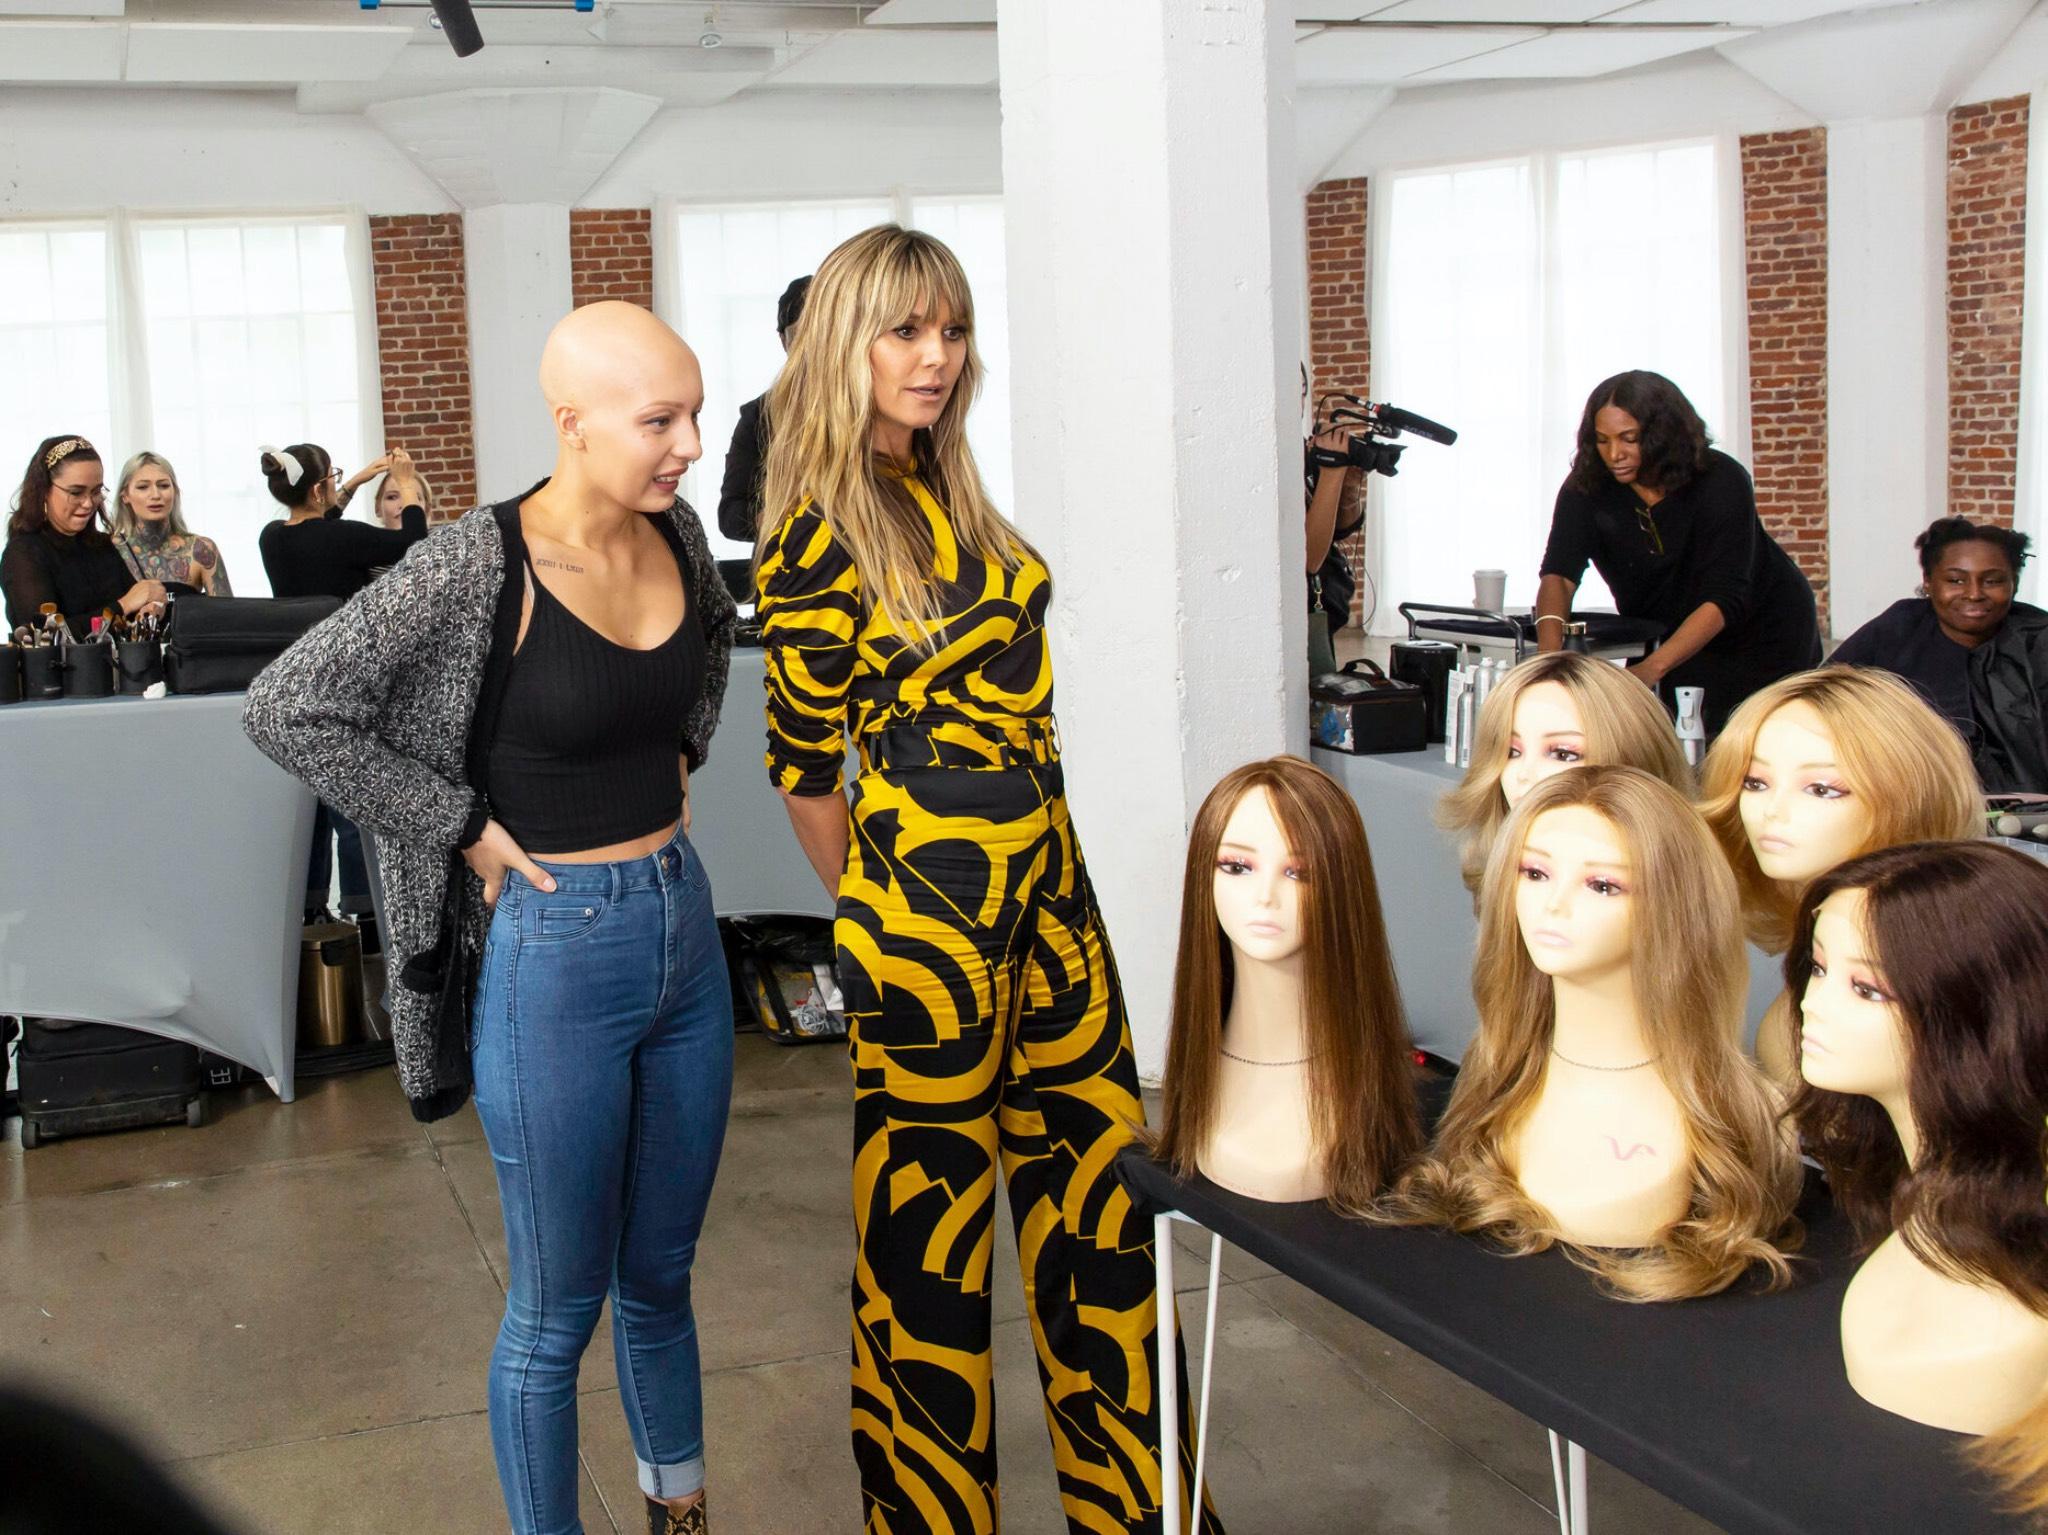 Germany´s next Topmodel - by Heidi Klum - Das Umstyling. Copyright: ProSieben/Sven Doornkaat; Fotograf: Sven Doornkaat; Bildredakteur: Susanne Karl-Metzger.